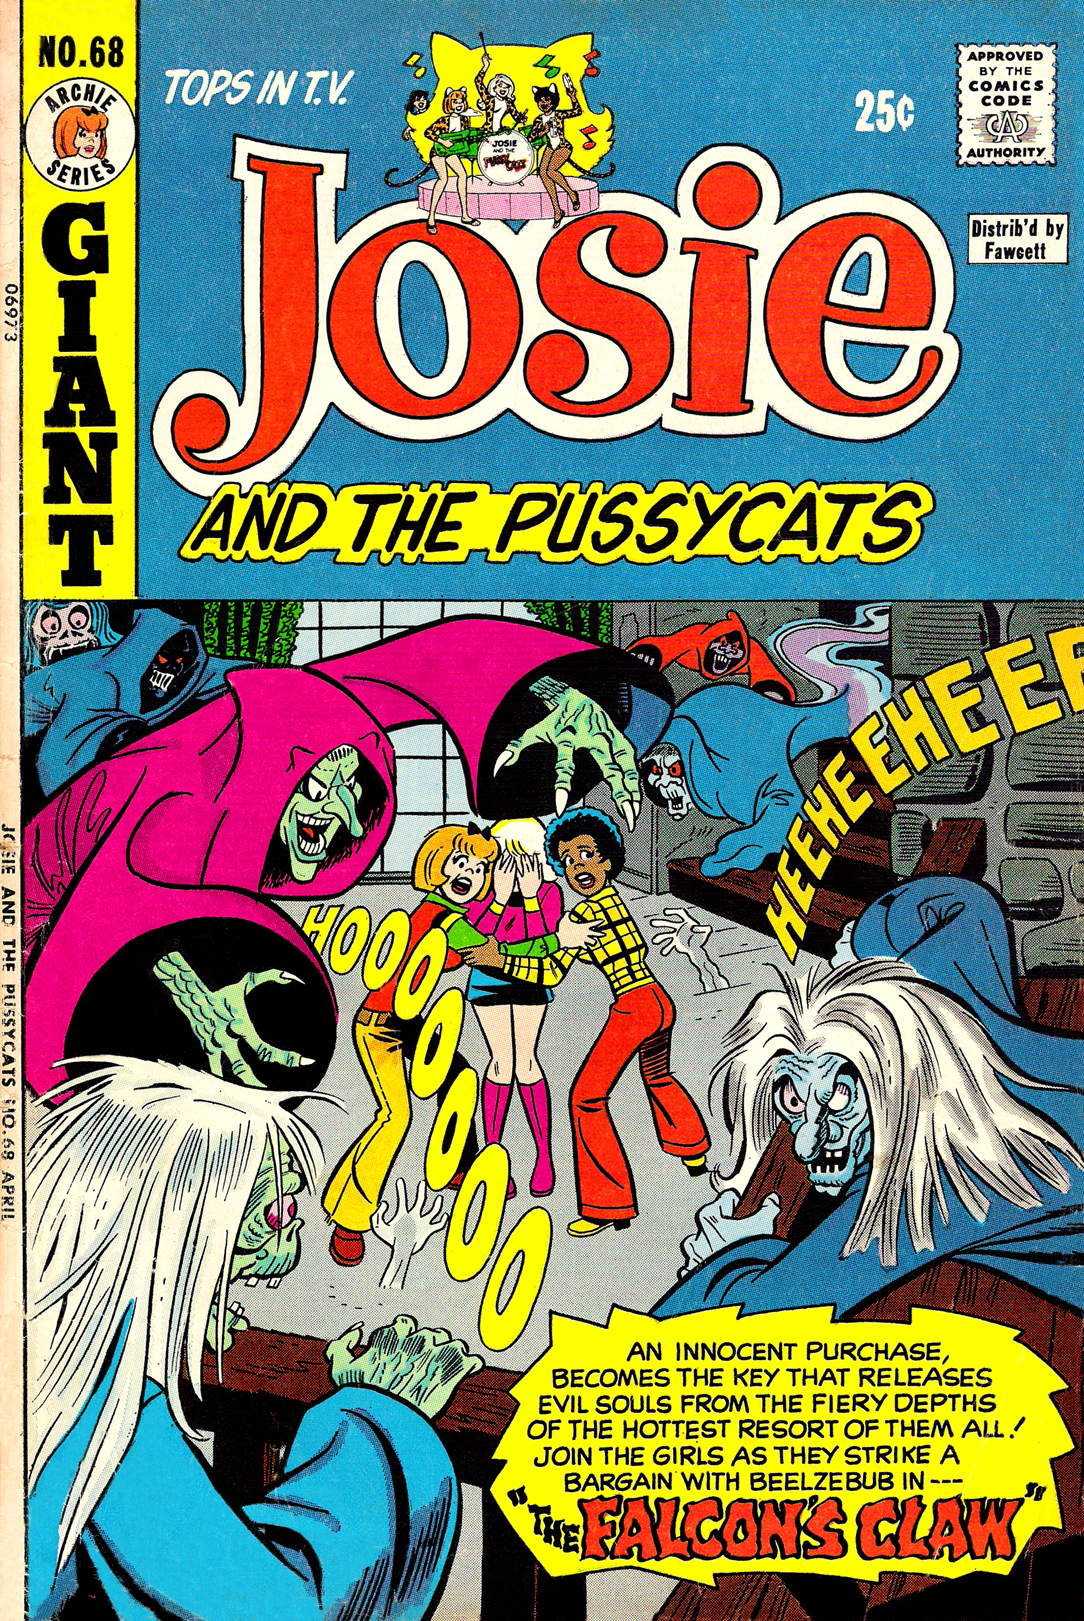 Read online She's Josie comic -  Issue #68 - 1